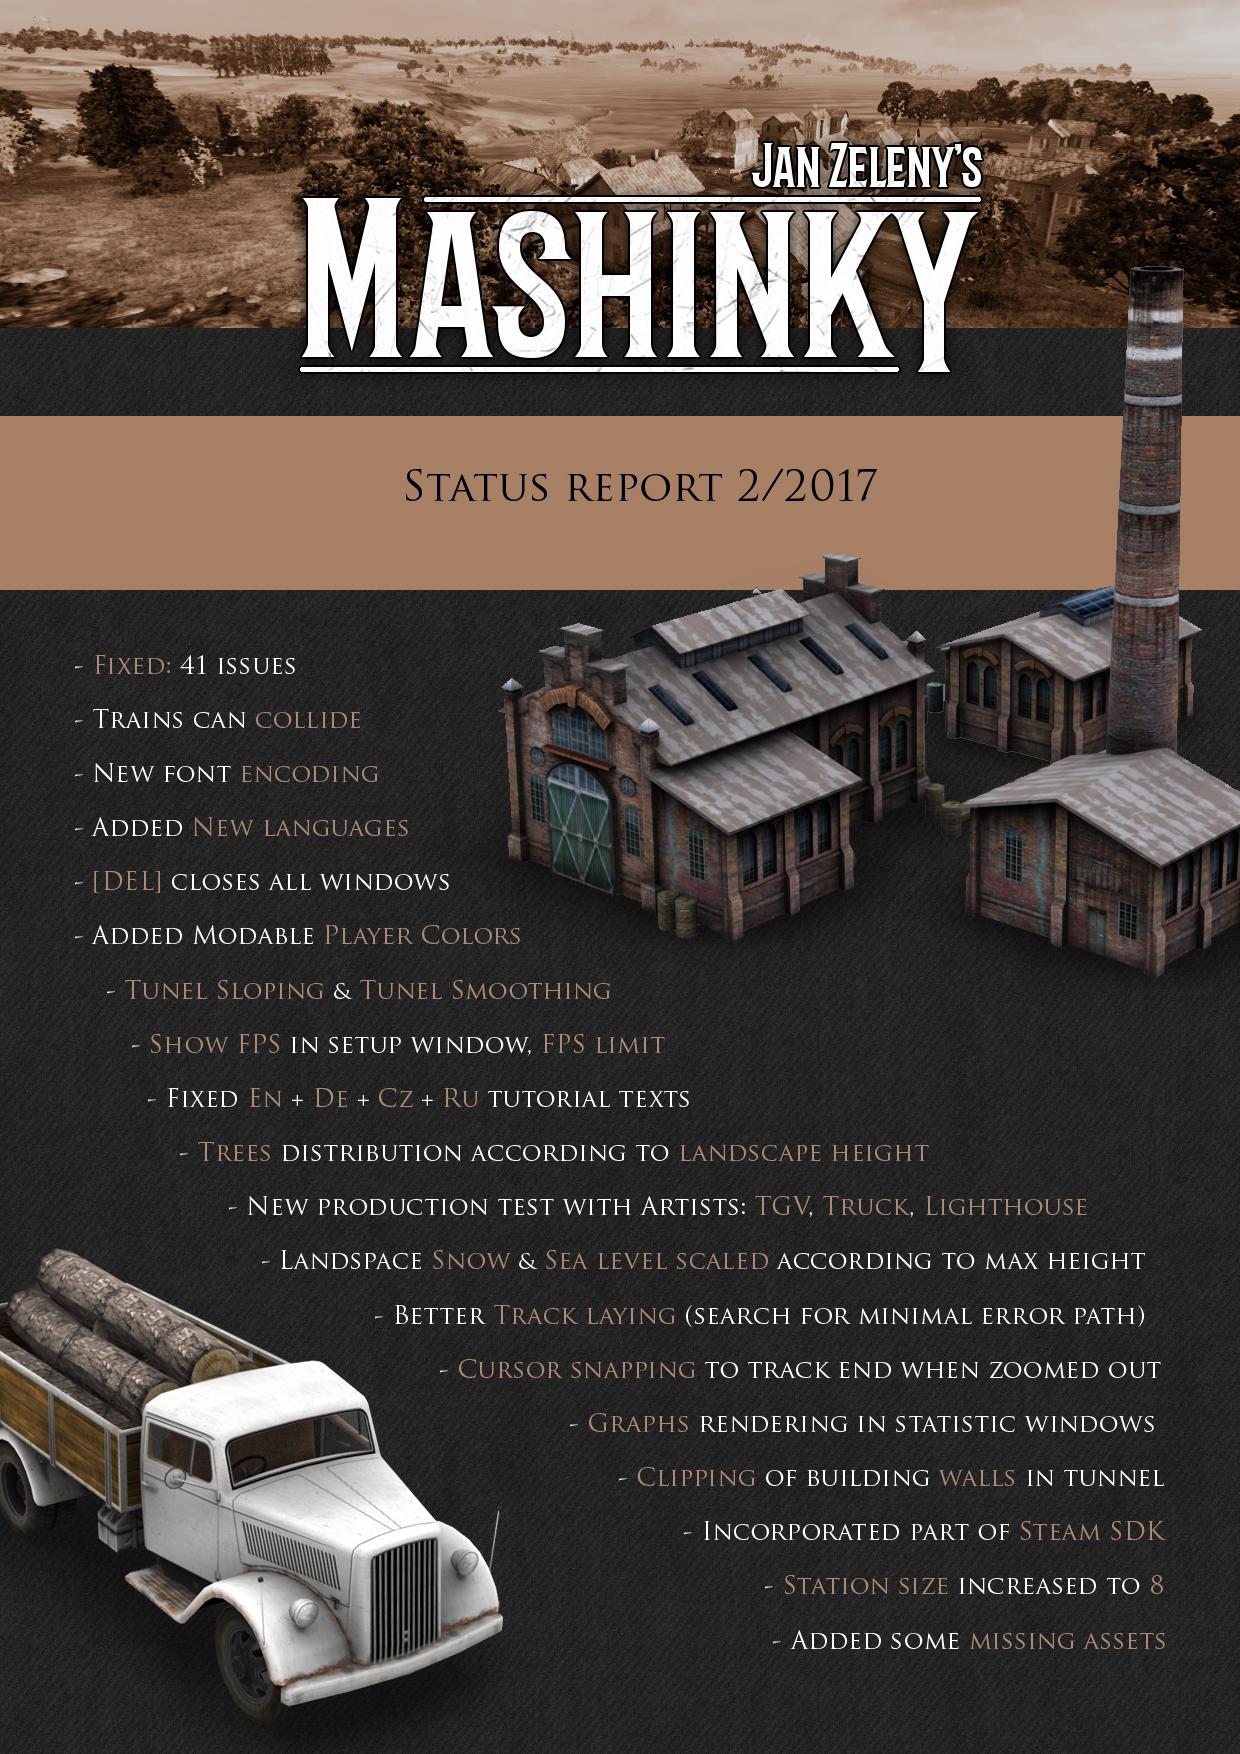 report  2/2017